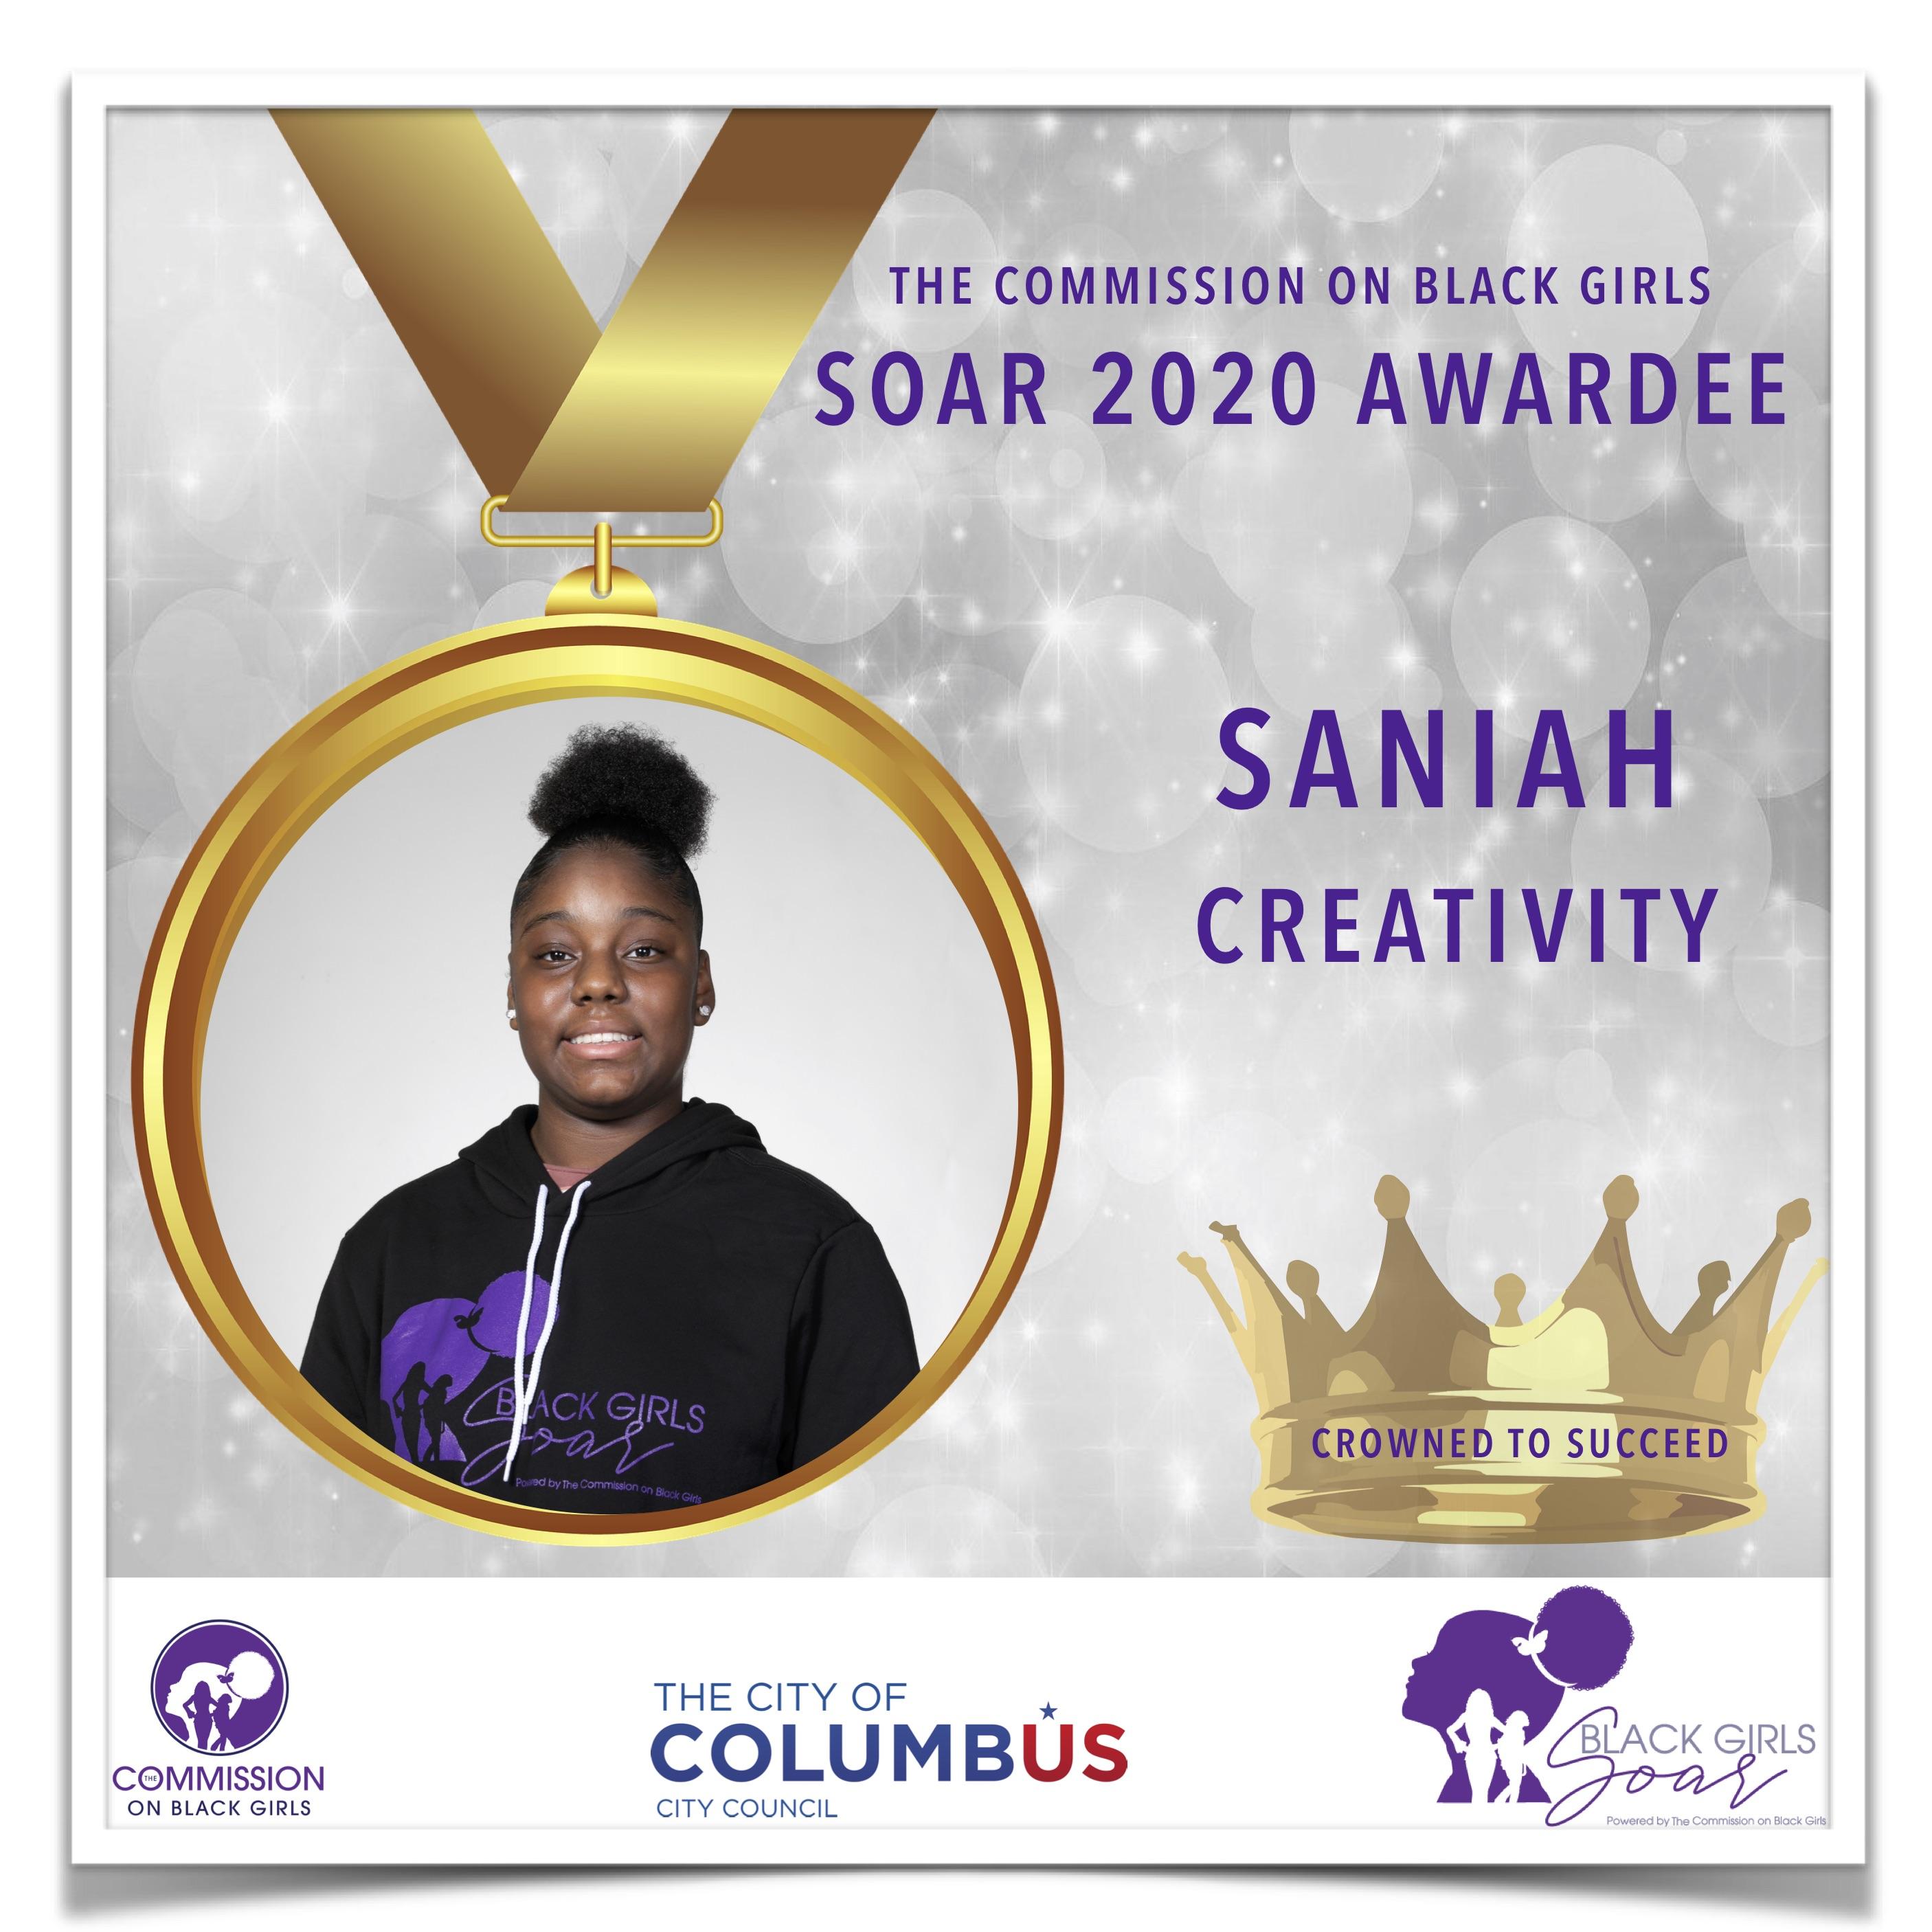 11 SOAR 2020 Saniah Creativity